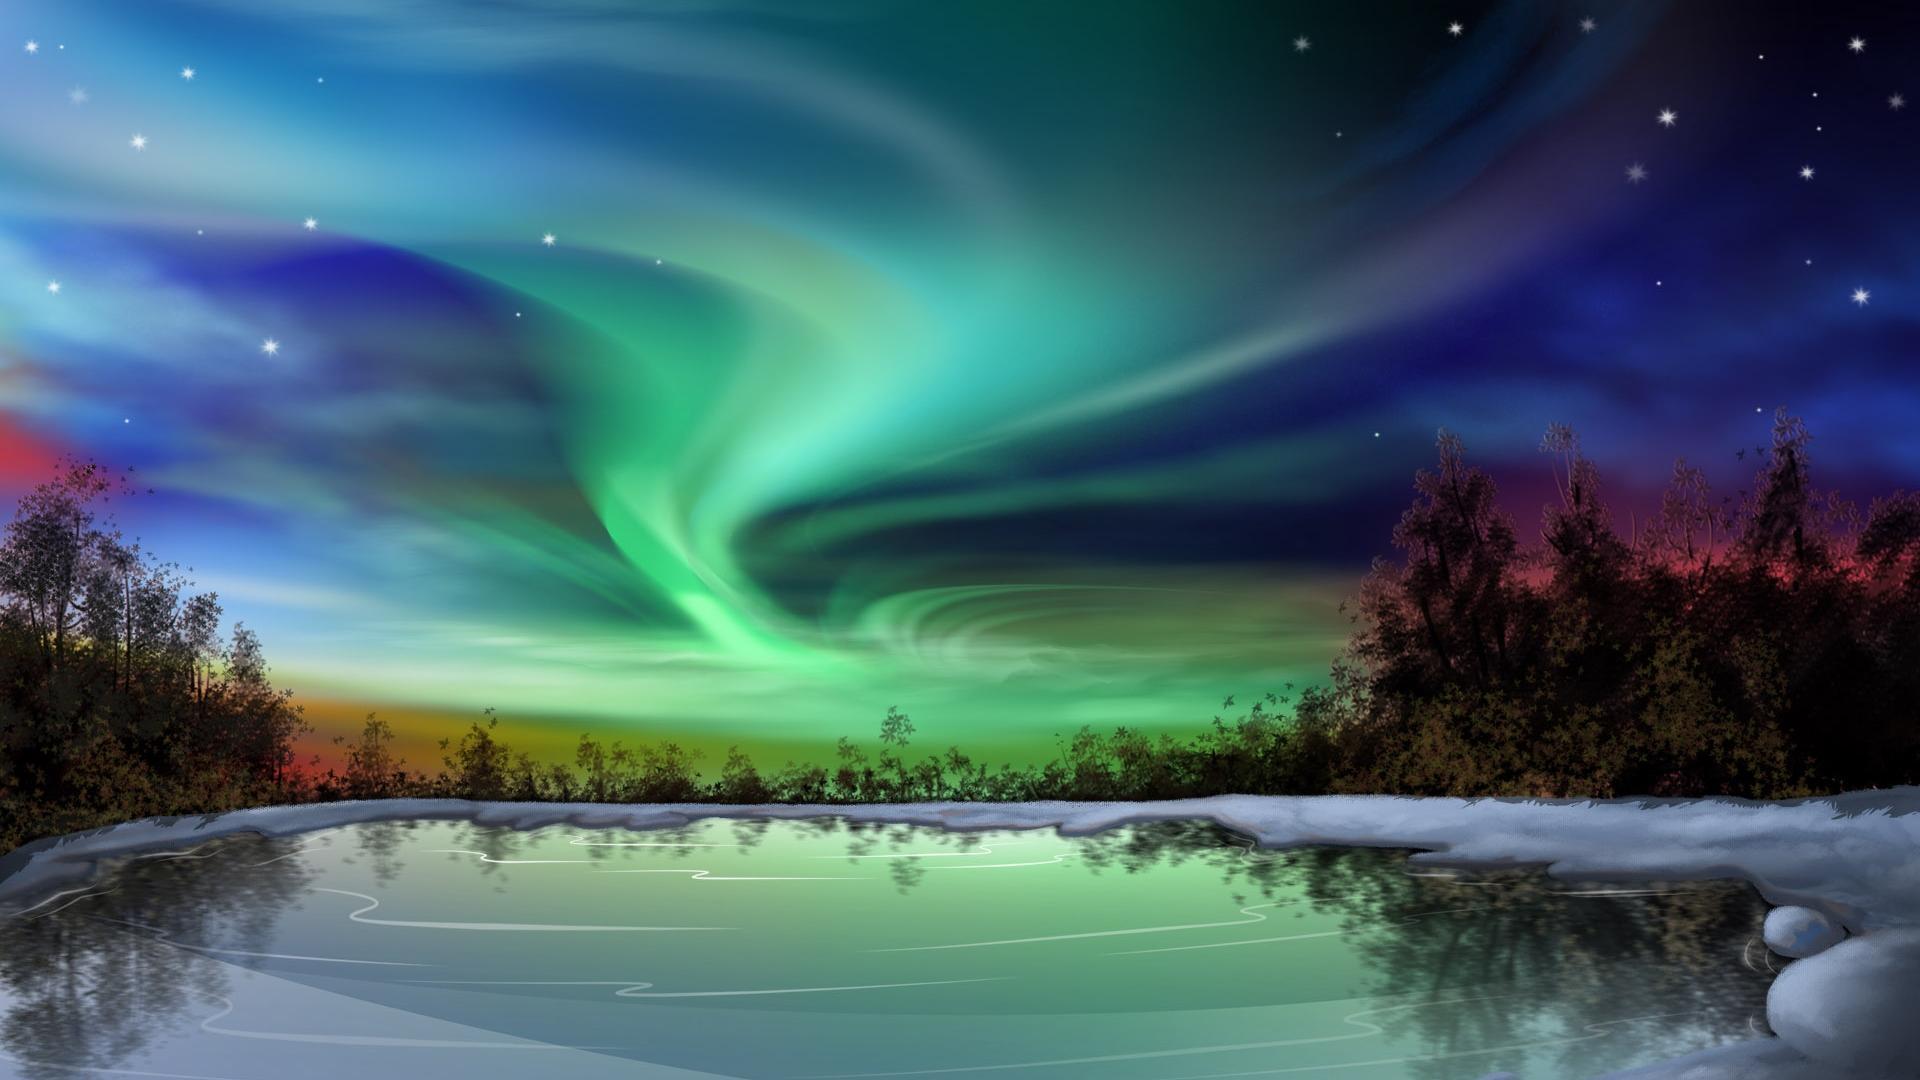 computer wallpaper background,sky,aurora,natural landscape,nature,atmosphere